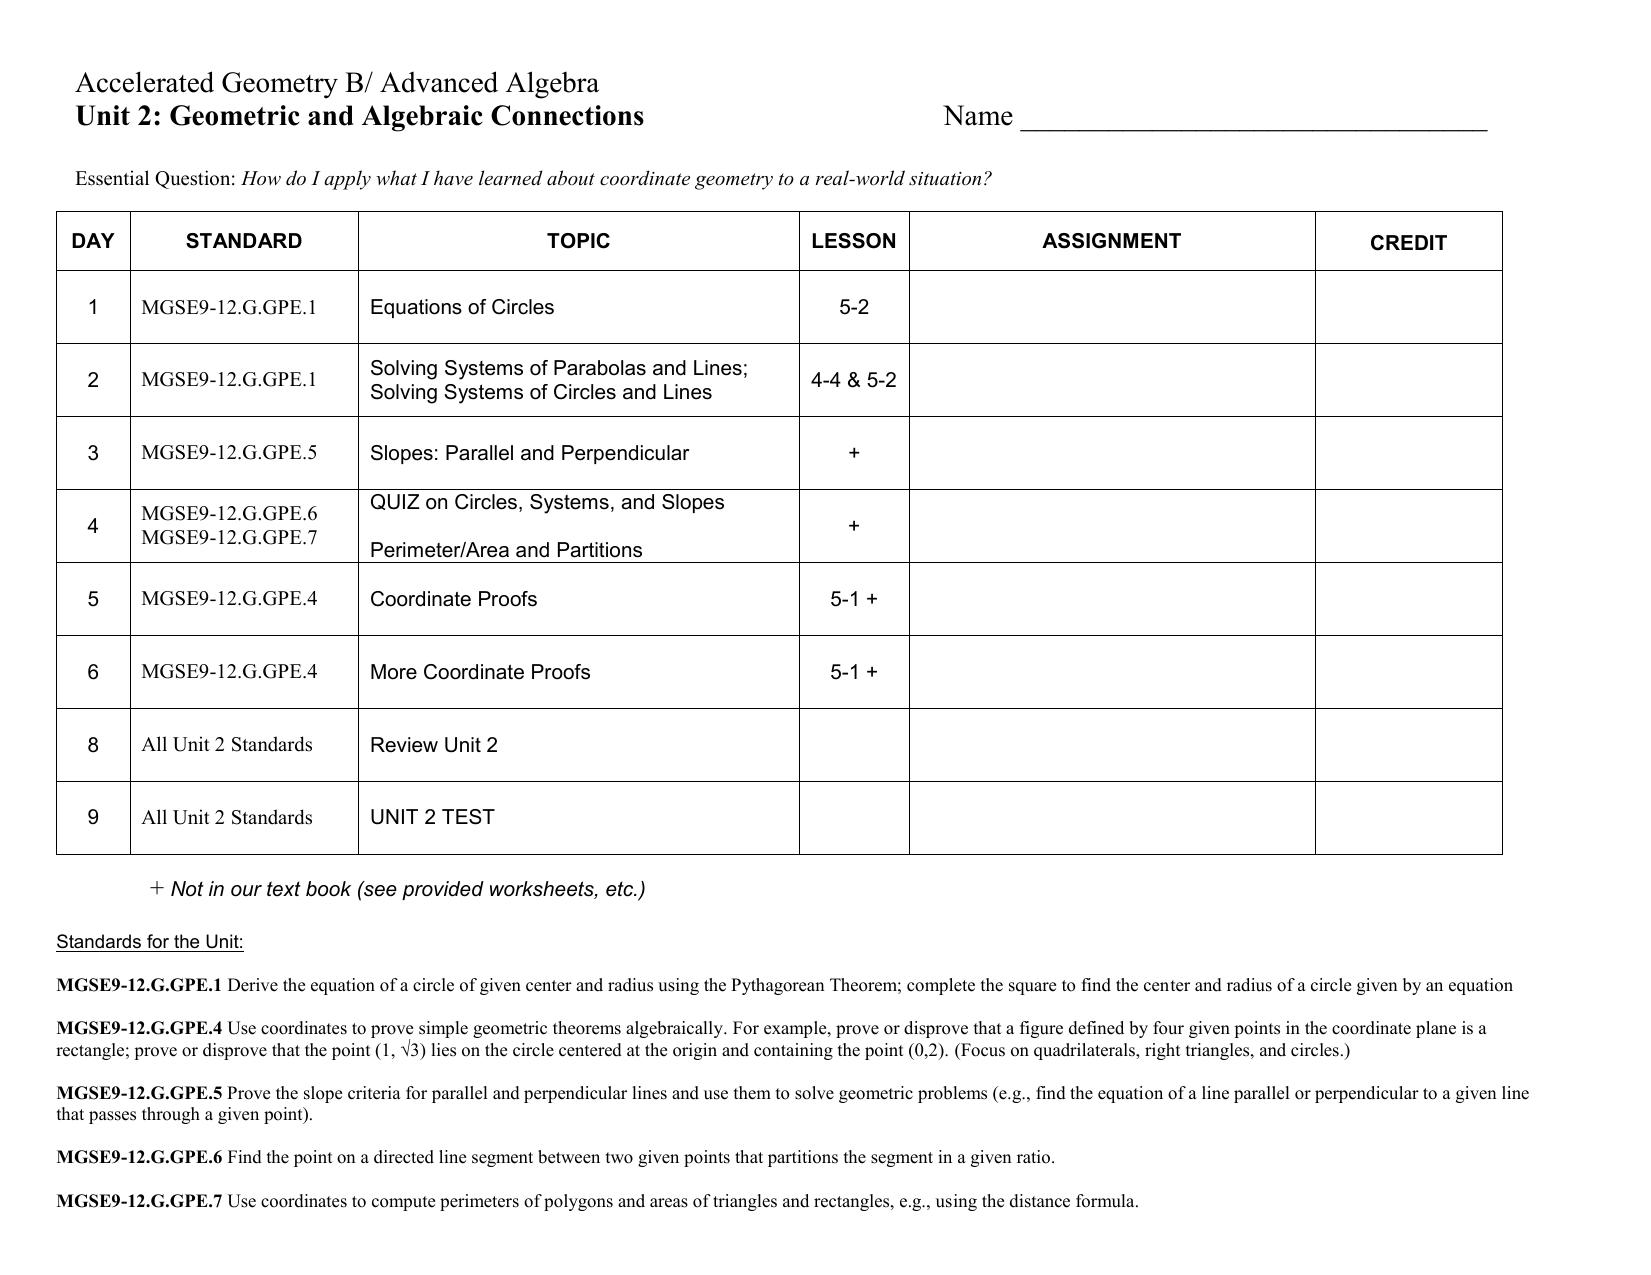 AGAA Unit 2 Plan (Geometric and Algebraic Connections)